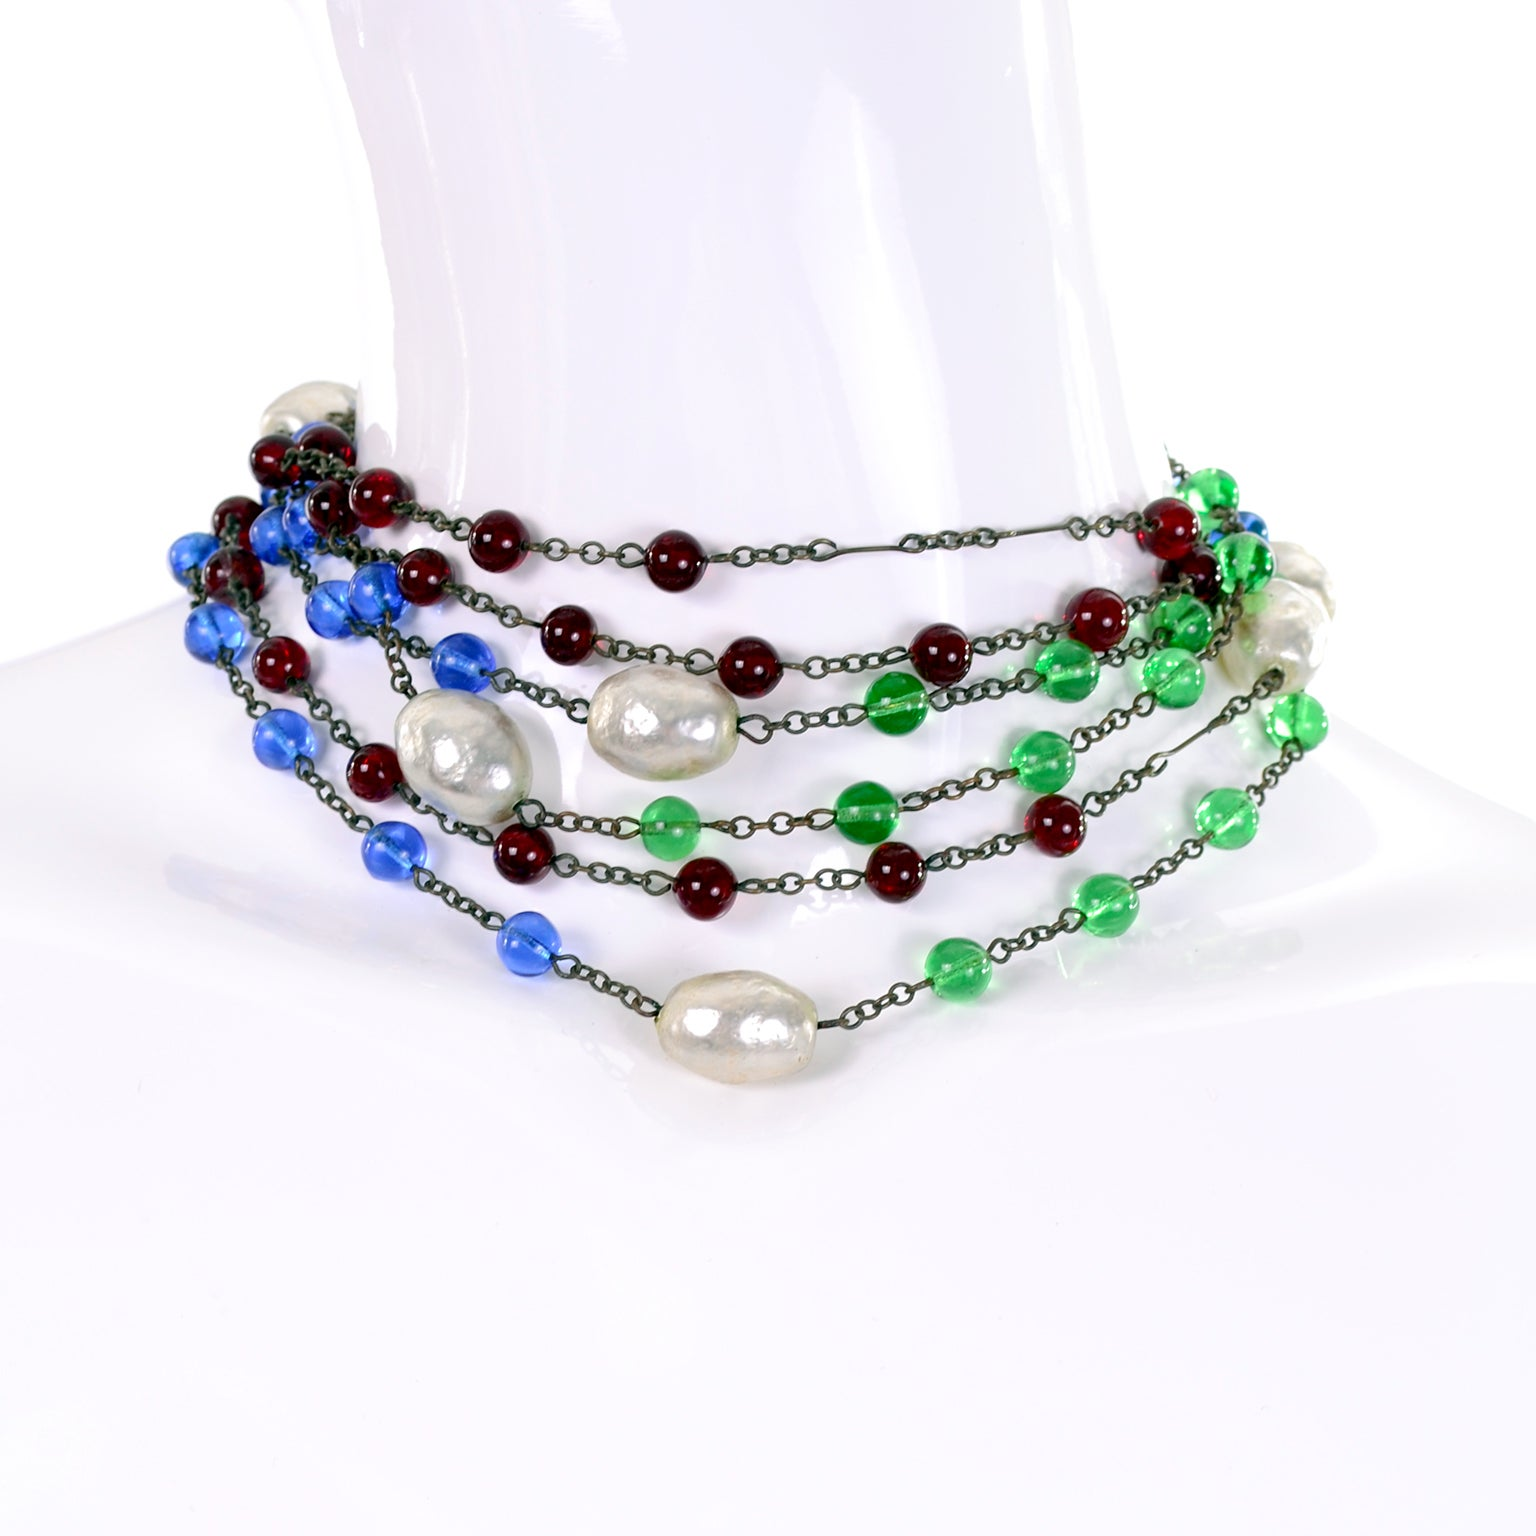 Art Deco rare beads lampwork beads 1920/'s red glass icicle beads Antique beads spiral beads red glass bead vintage beads 1920/'s beads